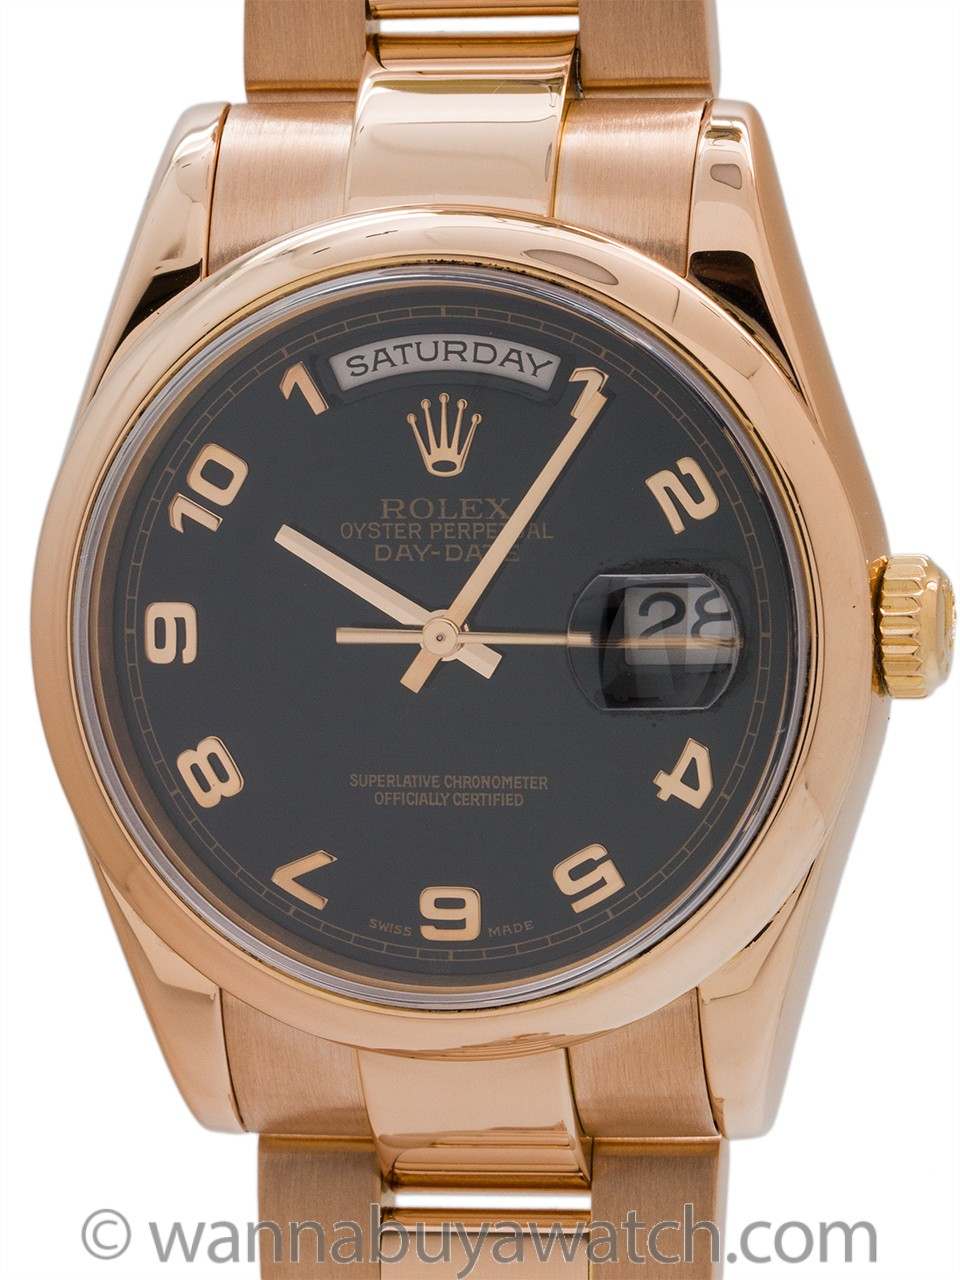 Rolex 18K PG Oyster President ref 118205 circa 2002